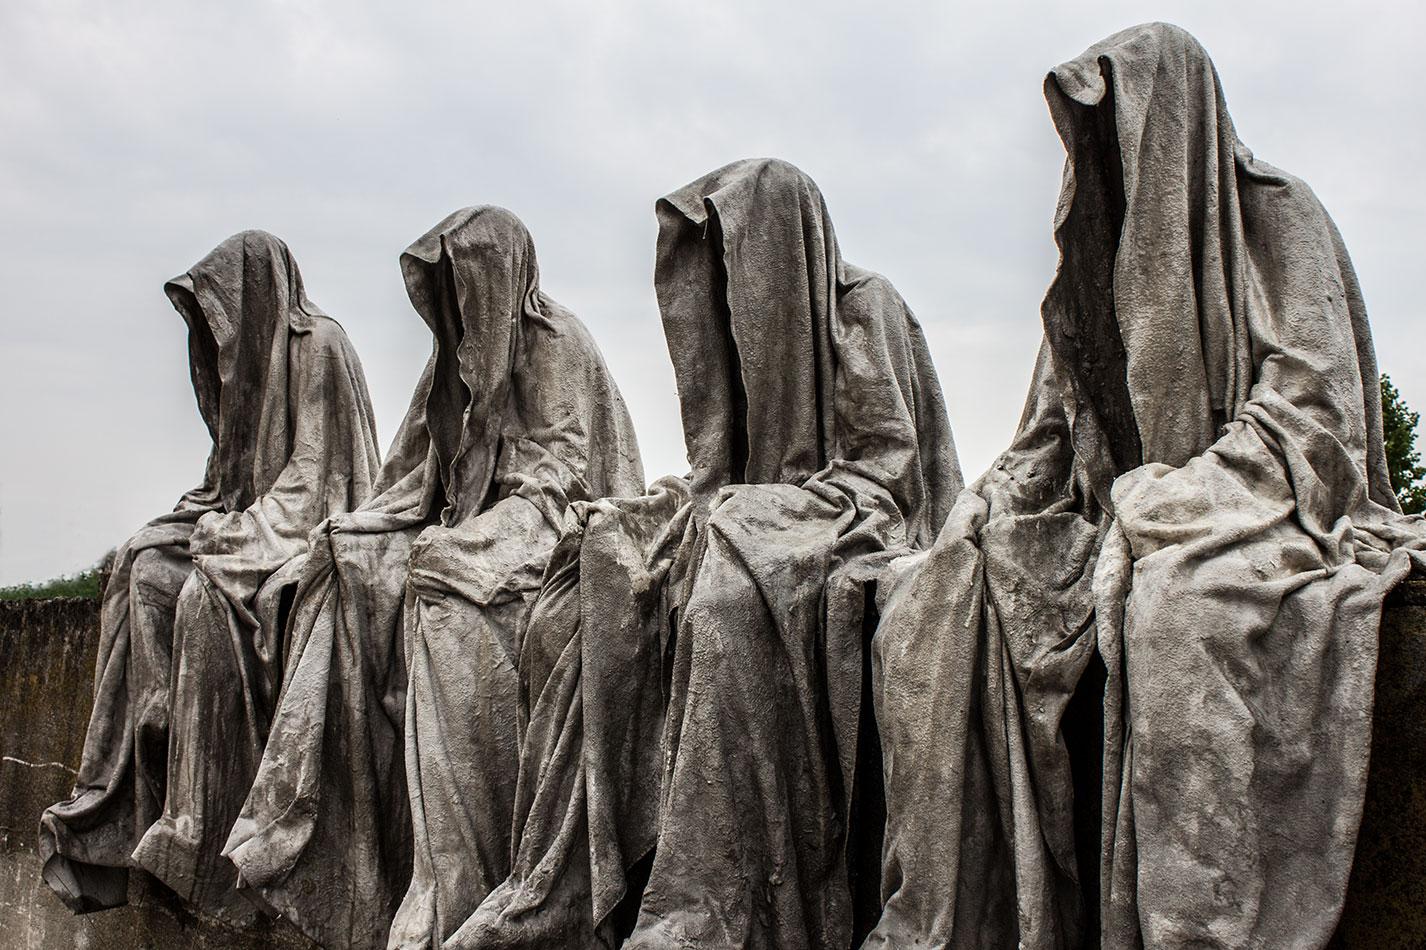 mobile-gallery-guardians-of-time-sculptor-manfred-kili-kielnhofer-contemporary-fine-art-design-sculpture-modern-famous-3d-statue-public-arts-2615